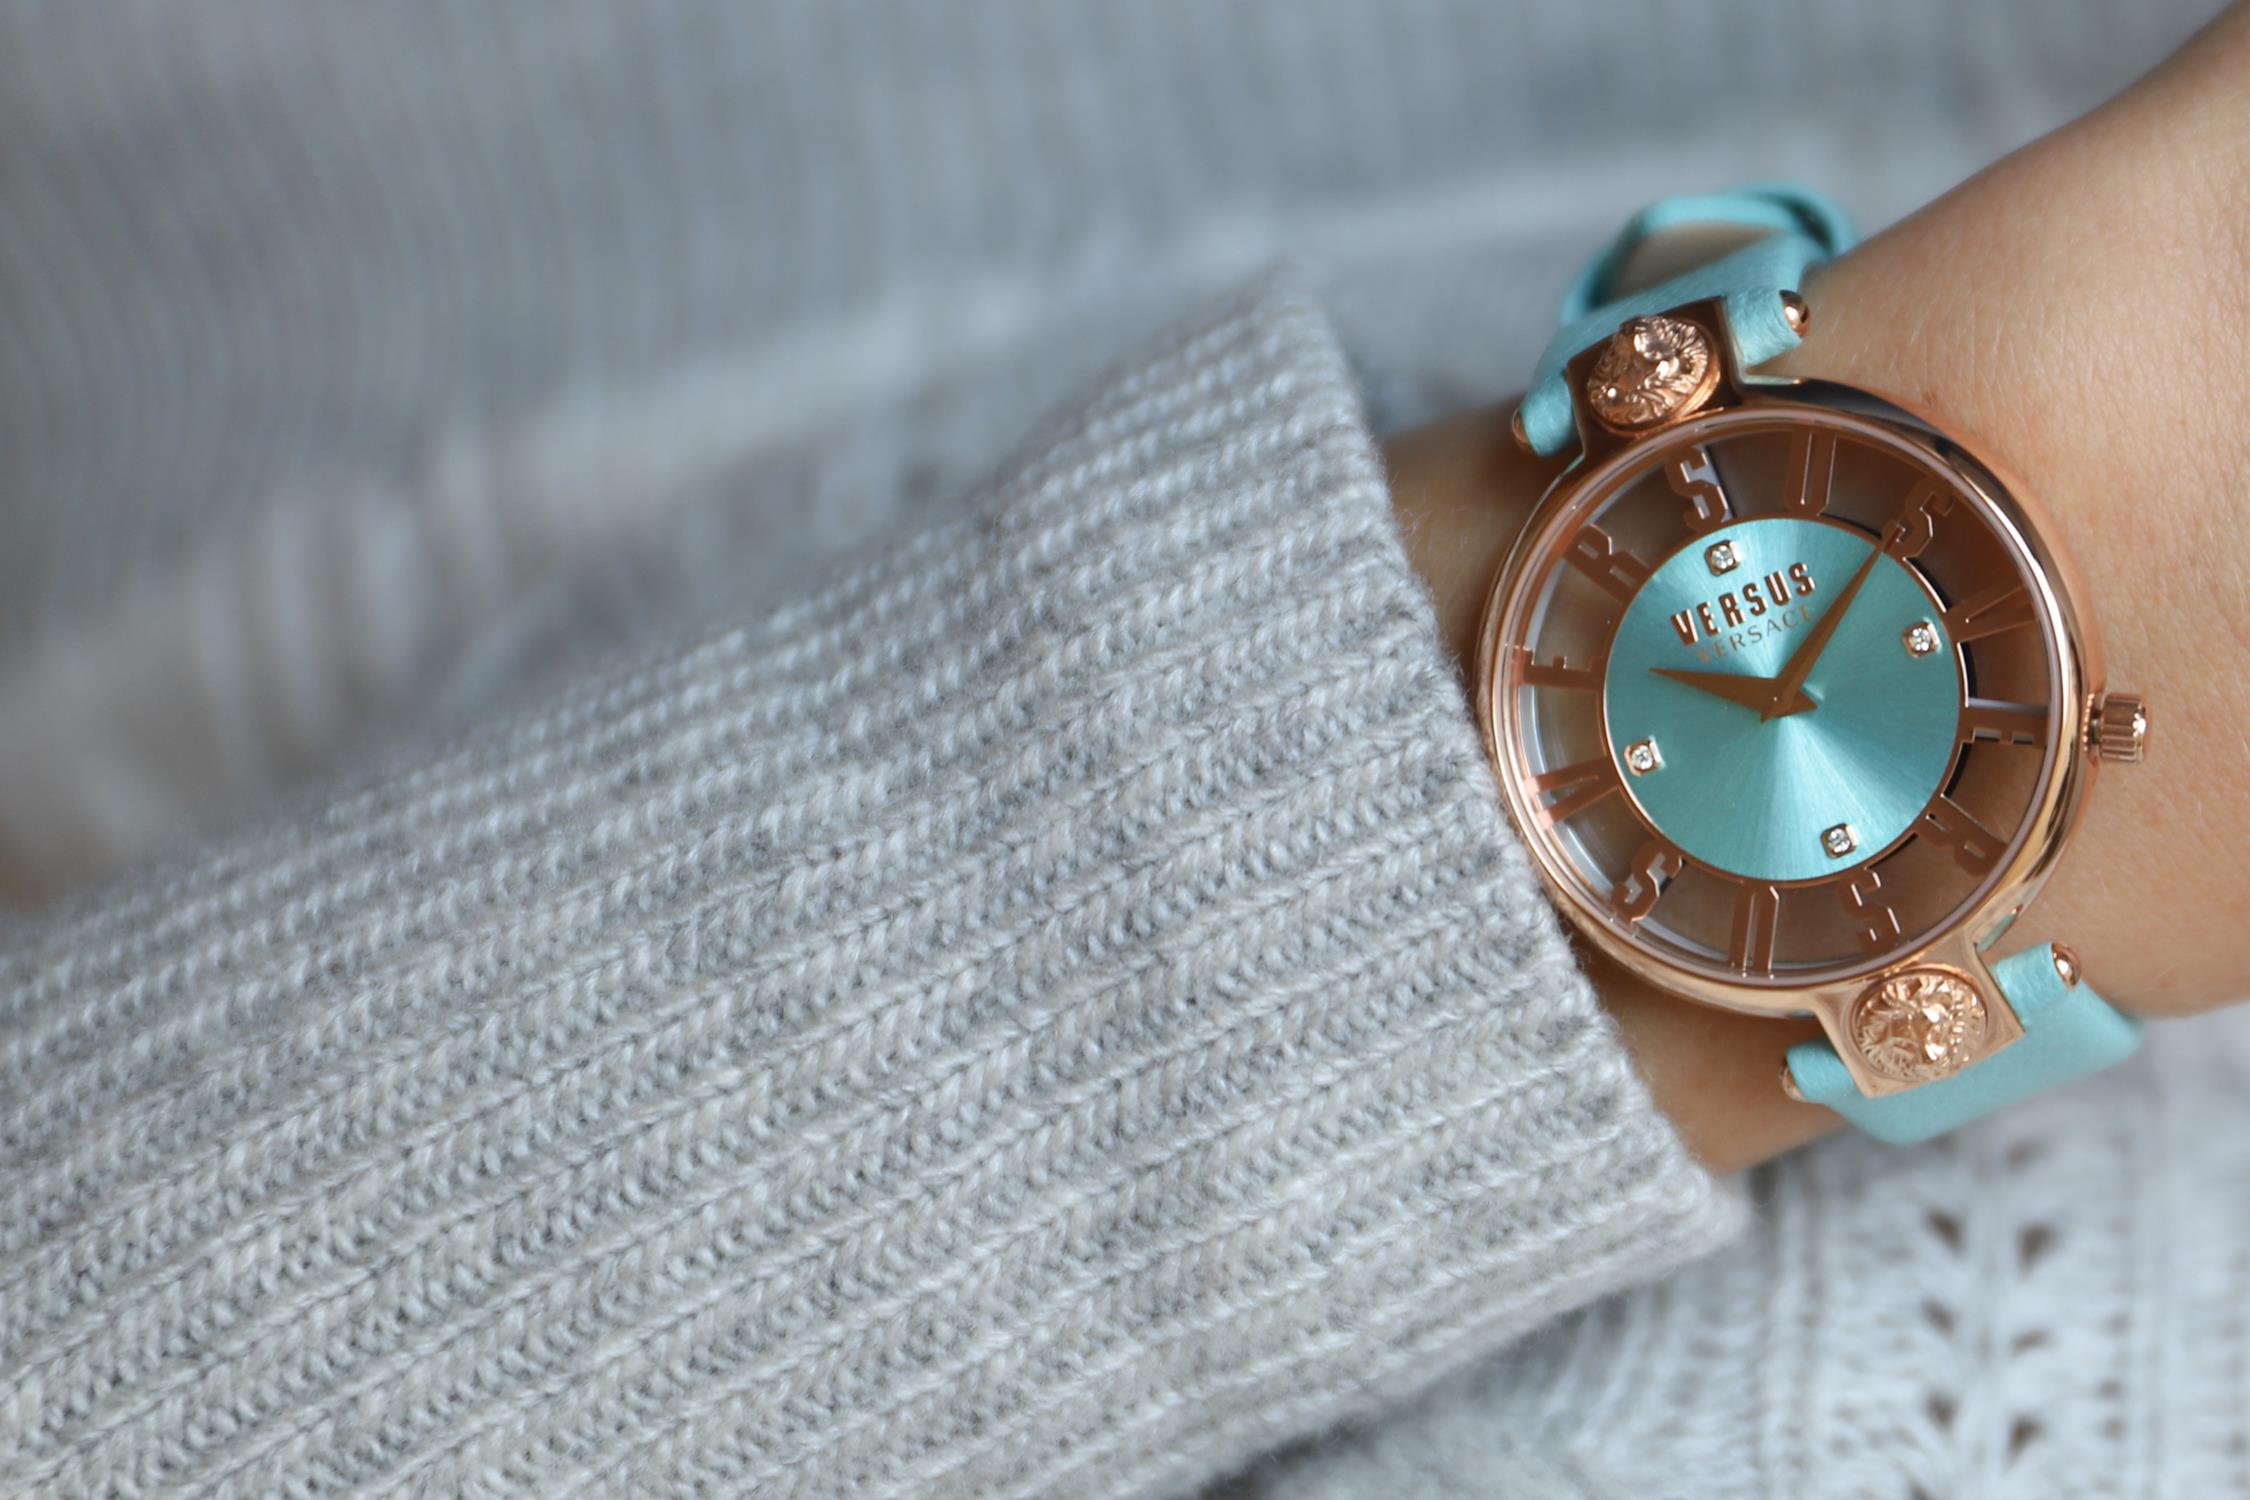 Versus Versace VSP490418 zegarek różowe złoto fashion/modowy Damskie pasek